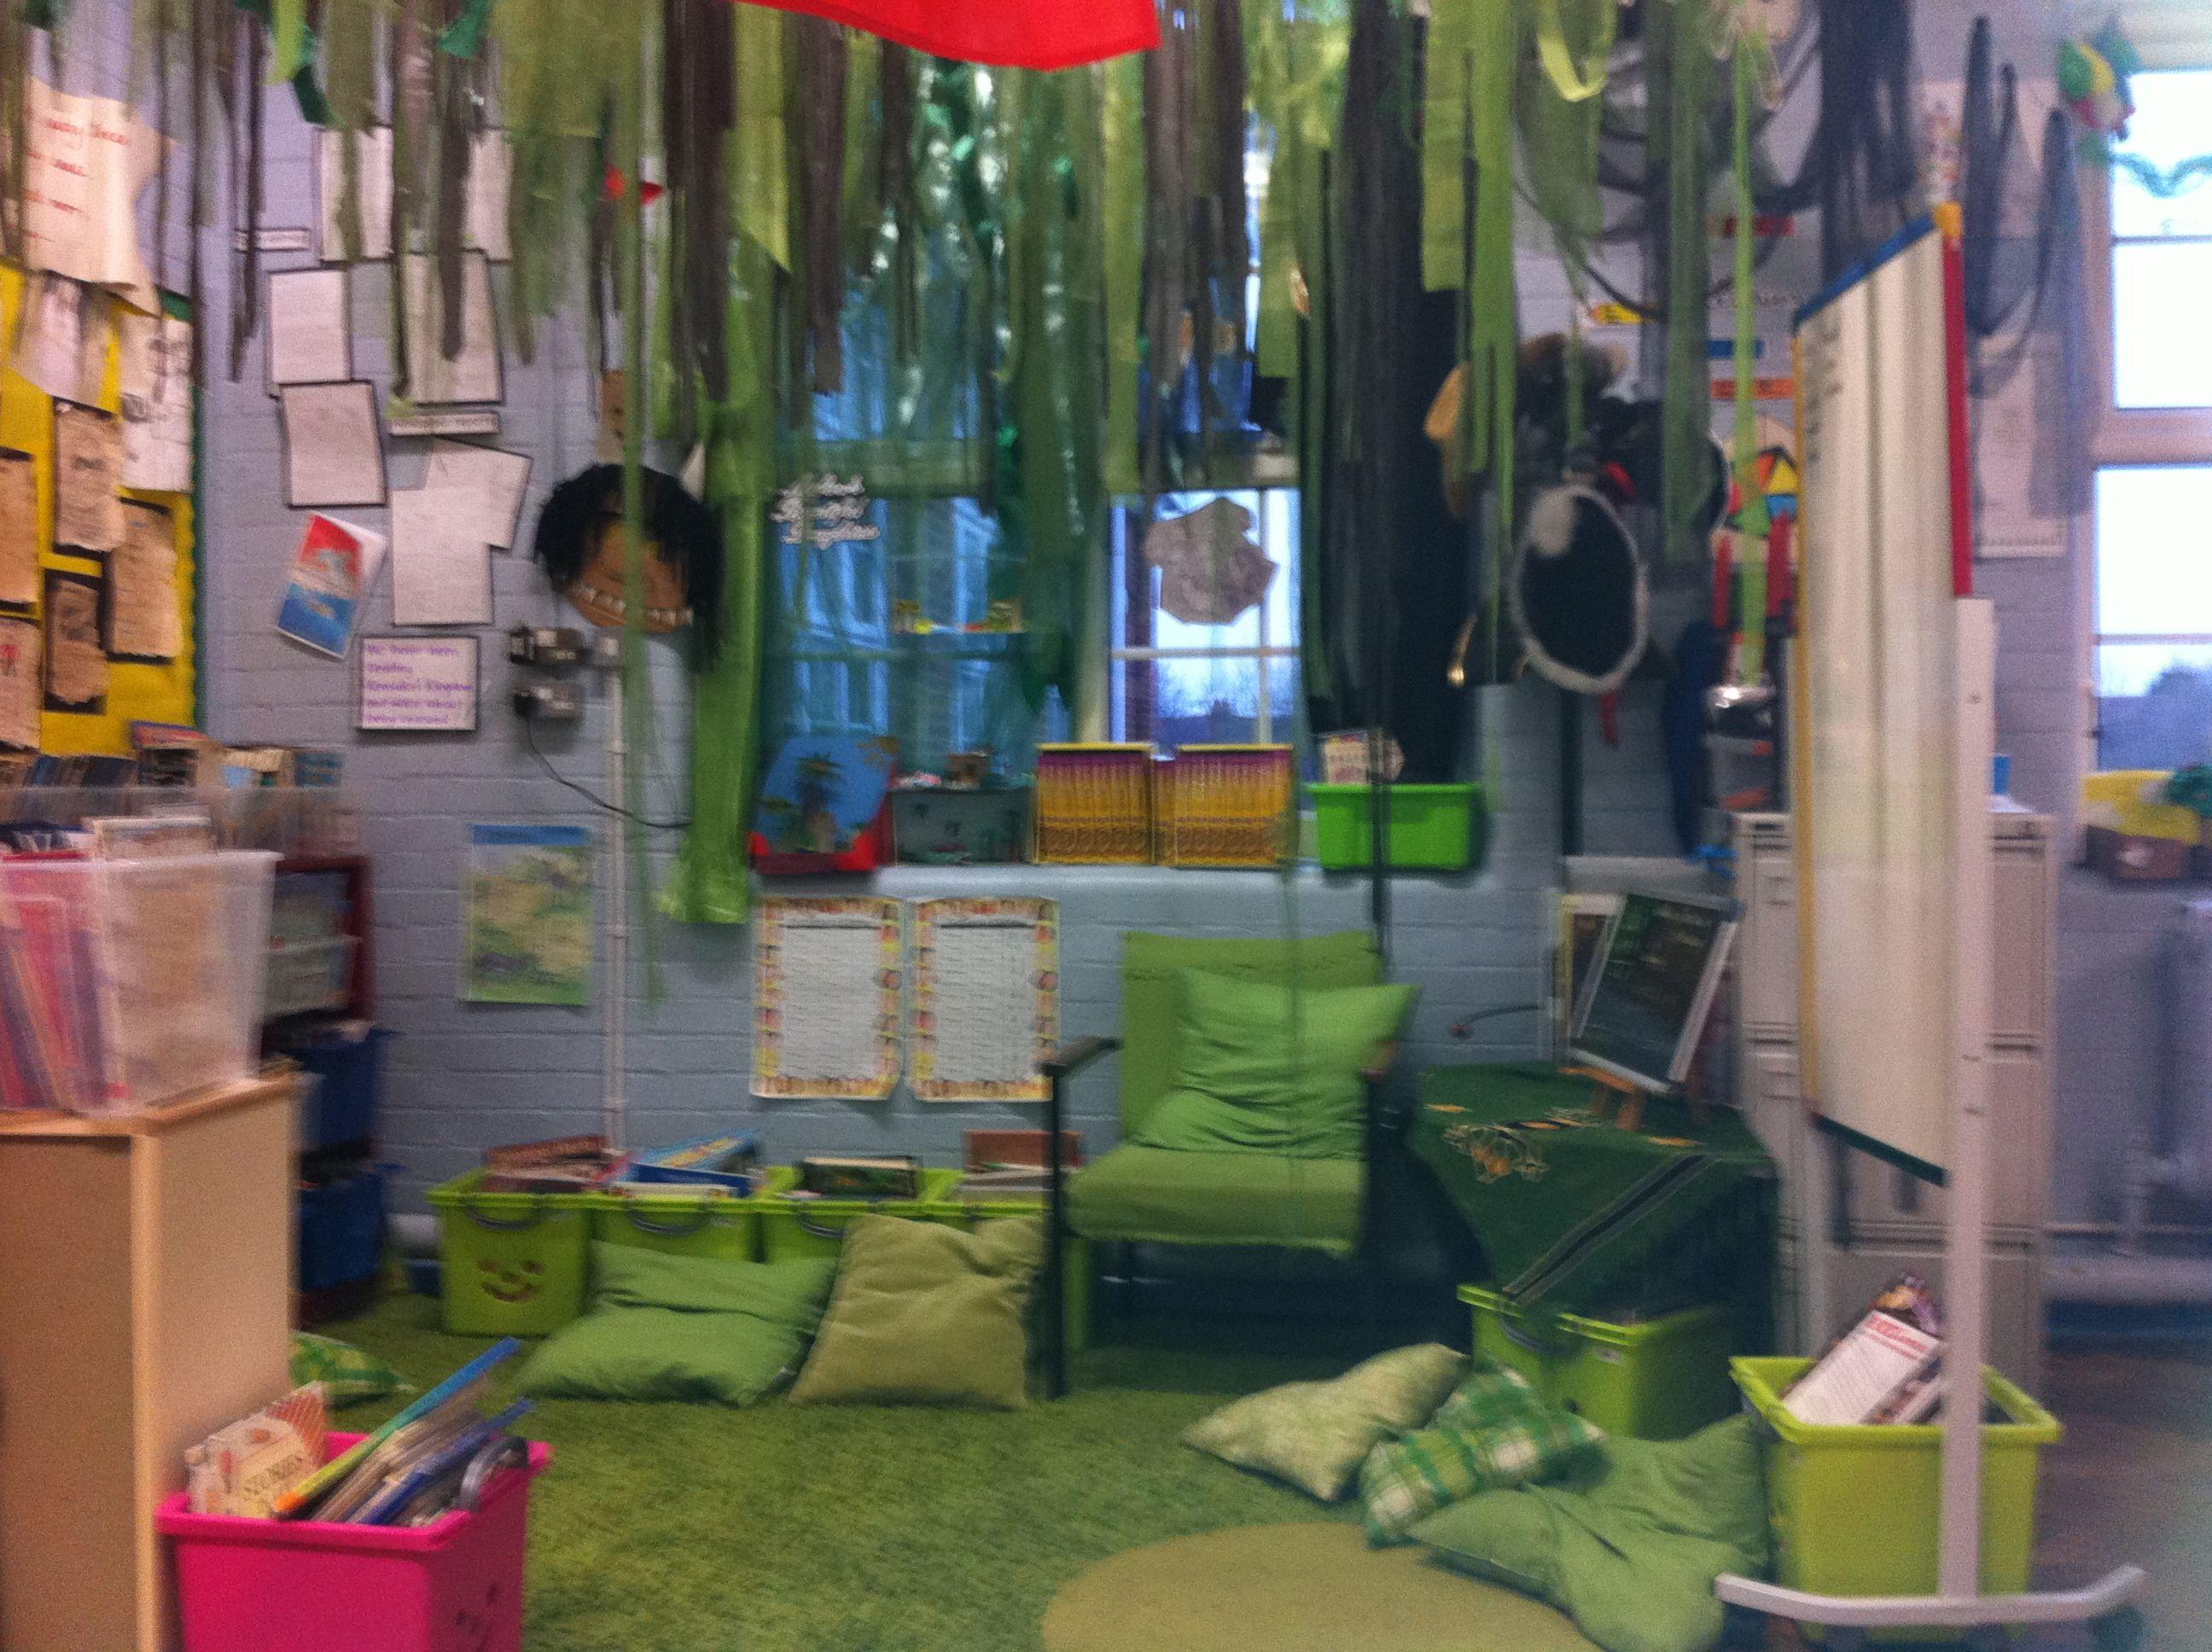 'Jungle' book corner! | Book corners, Book corner display ...